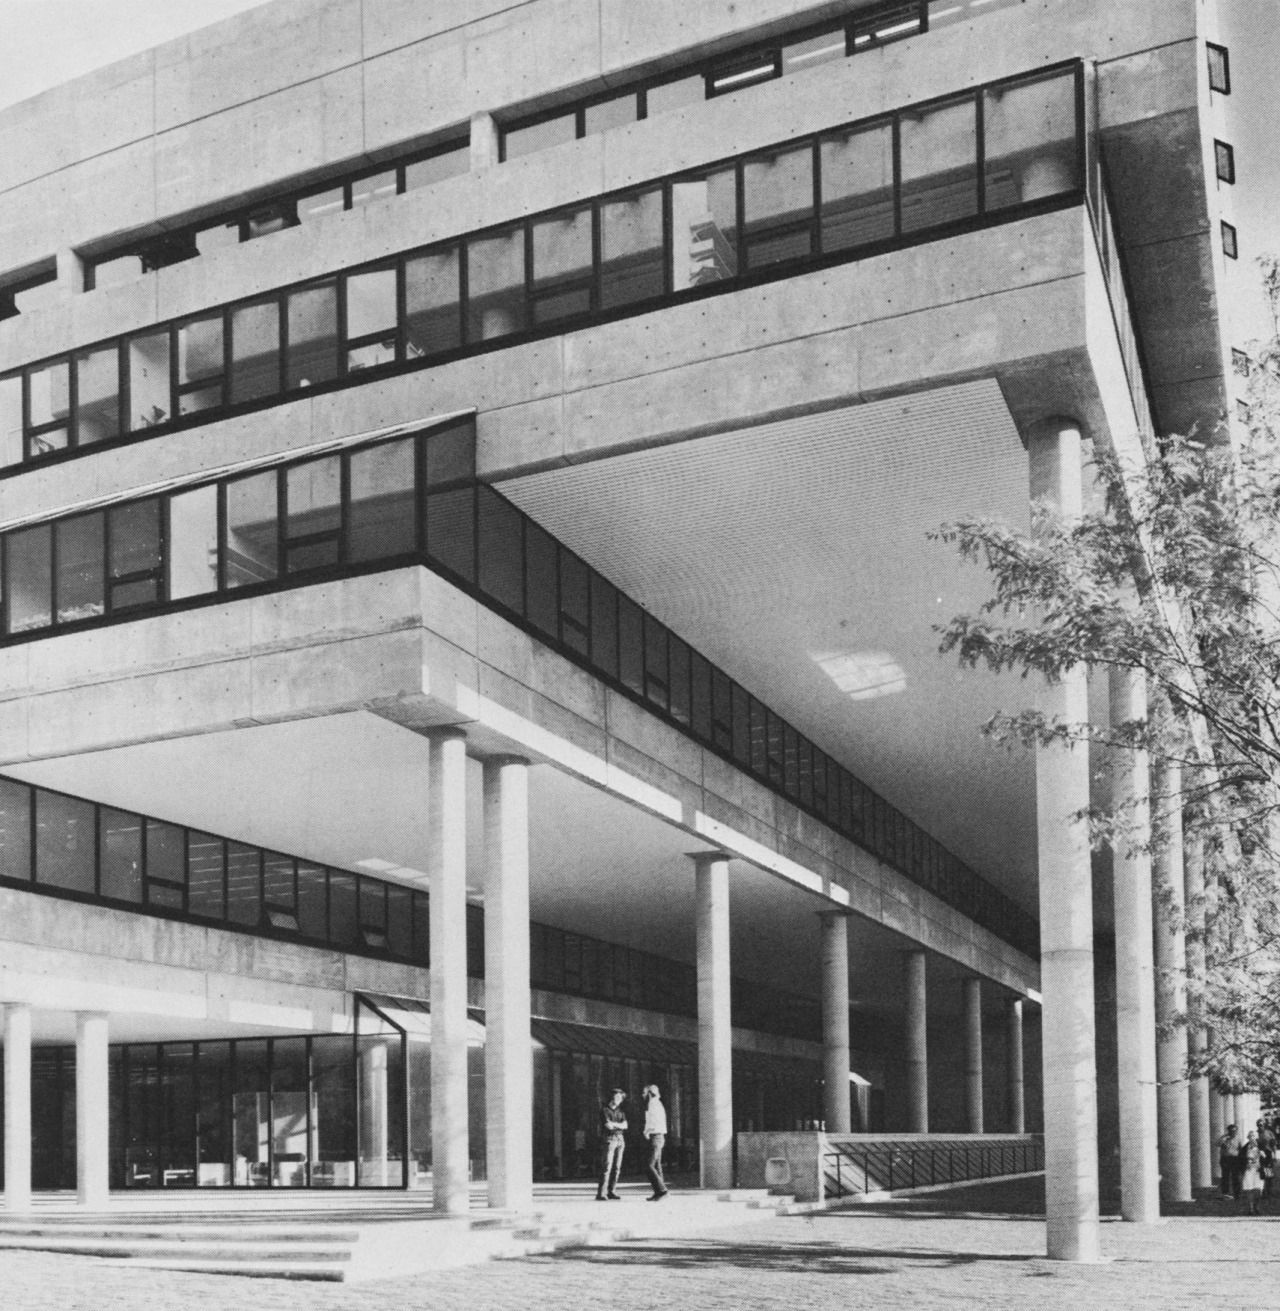 George Gund Hall, Harvard University, Cambridge, Massachusetts, 1972 (John Andrews, Anderson, Baldwin)